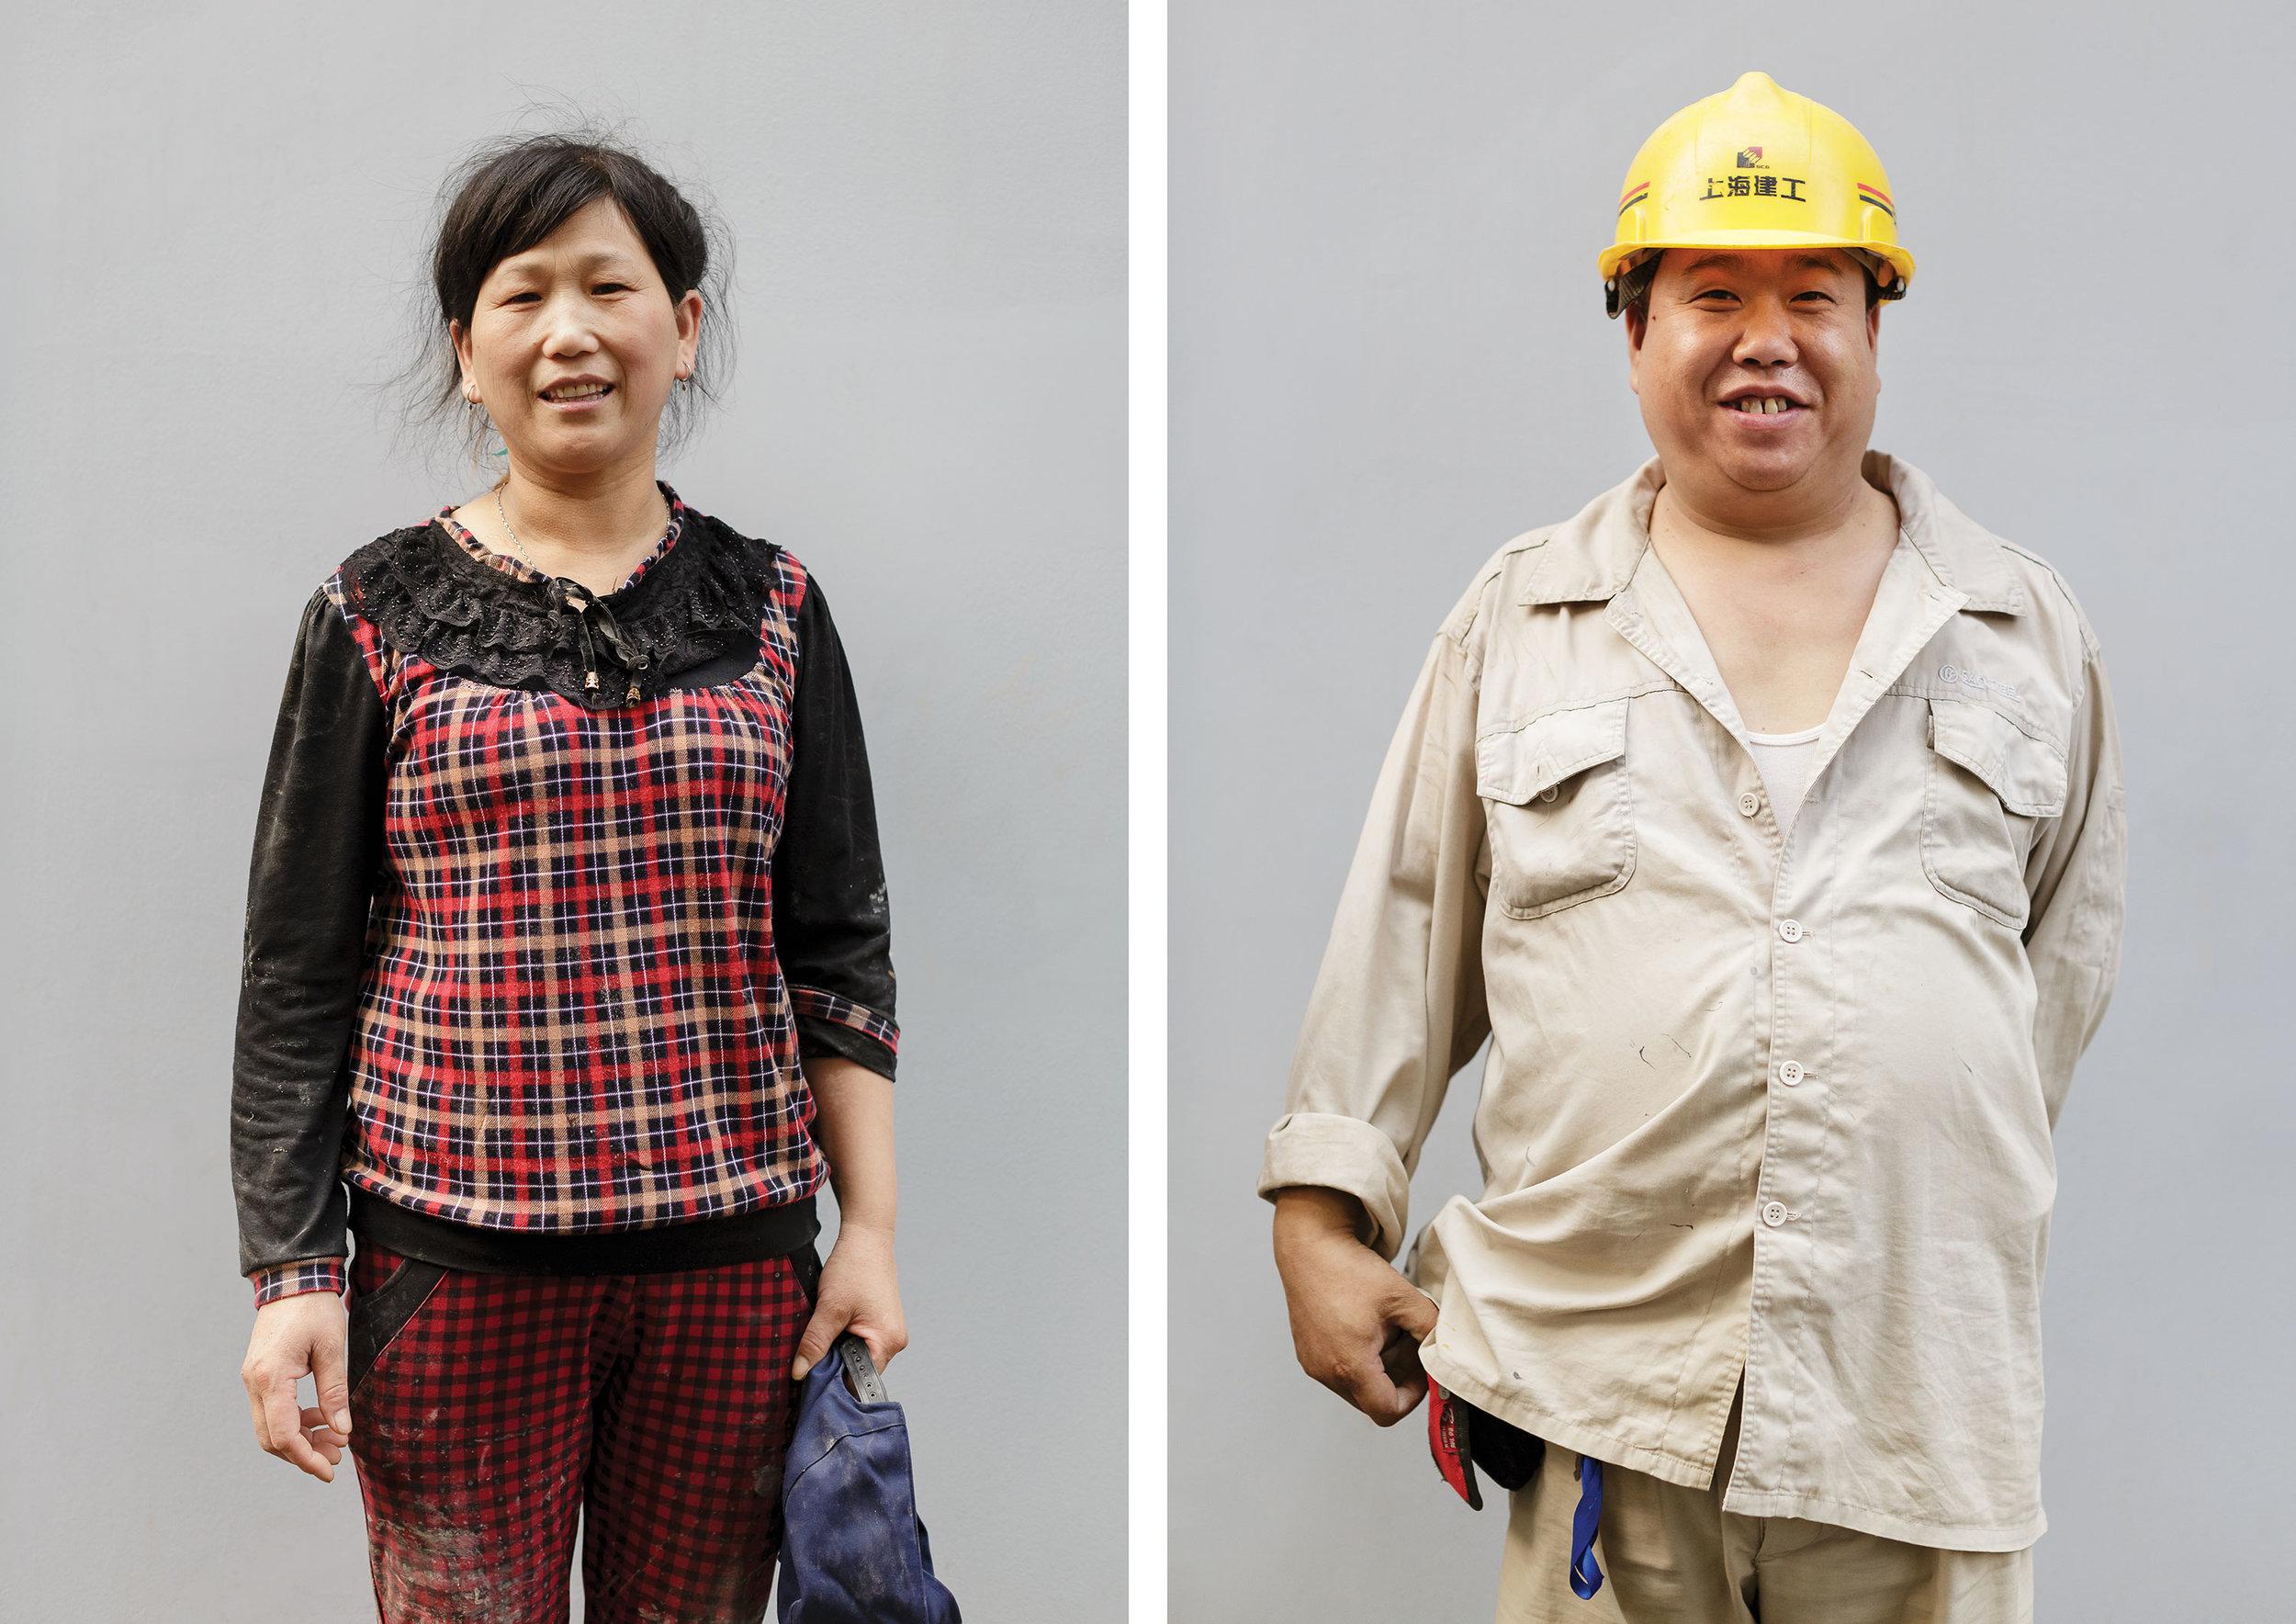 Shanghai_Tower-workers-and-building9.jpg